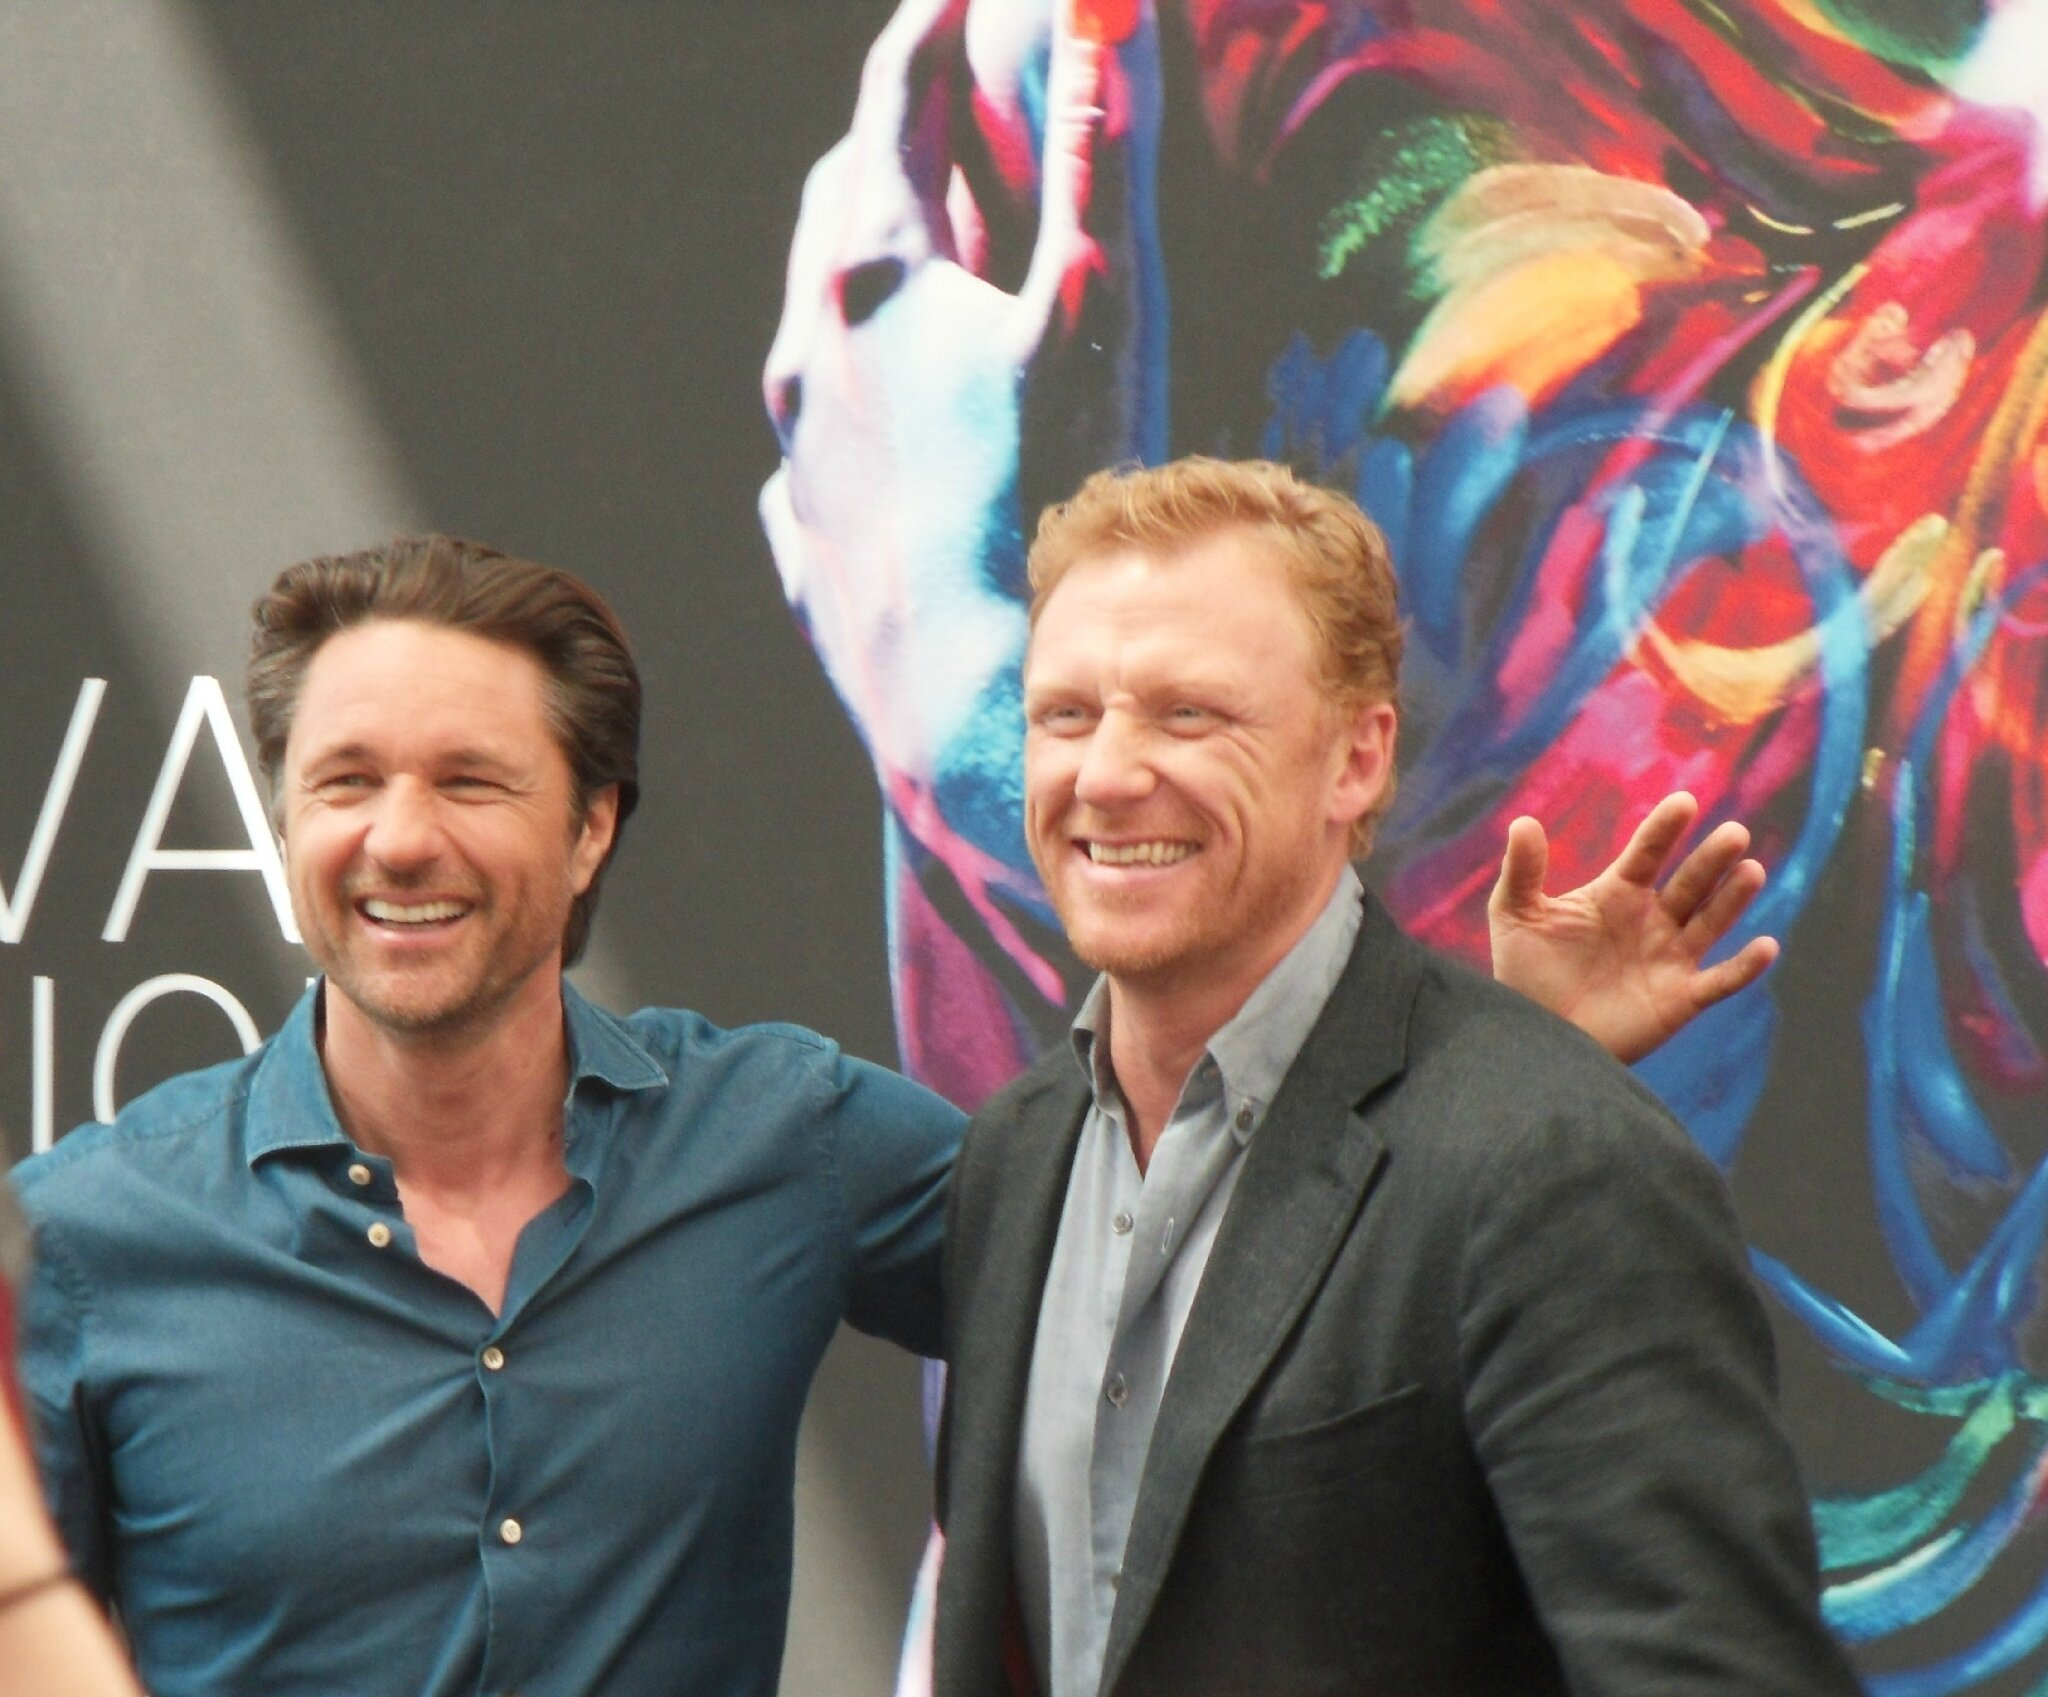 Monte Carlo 2016 - Martin Henderson & Kevin McKidd